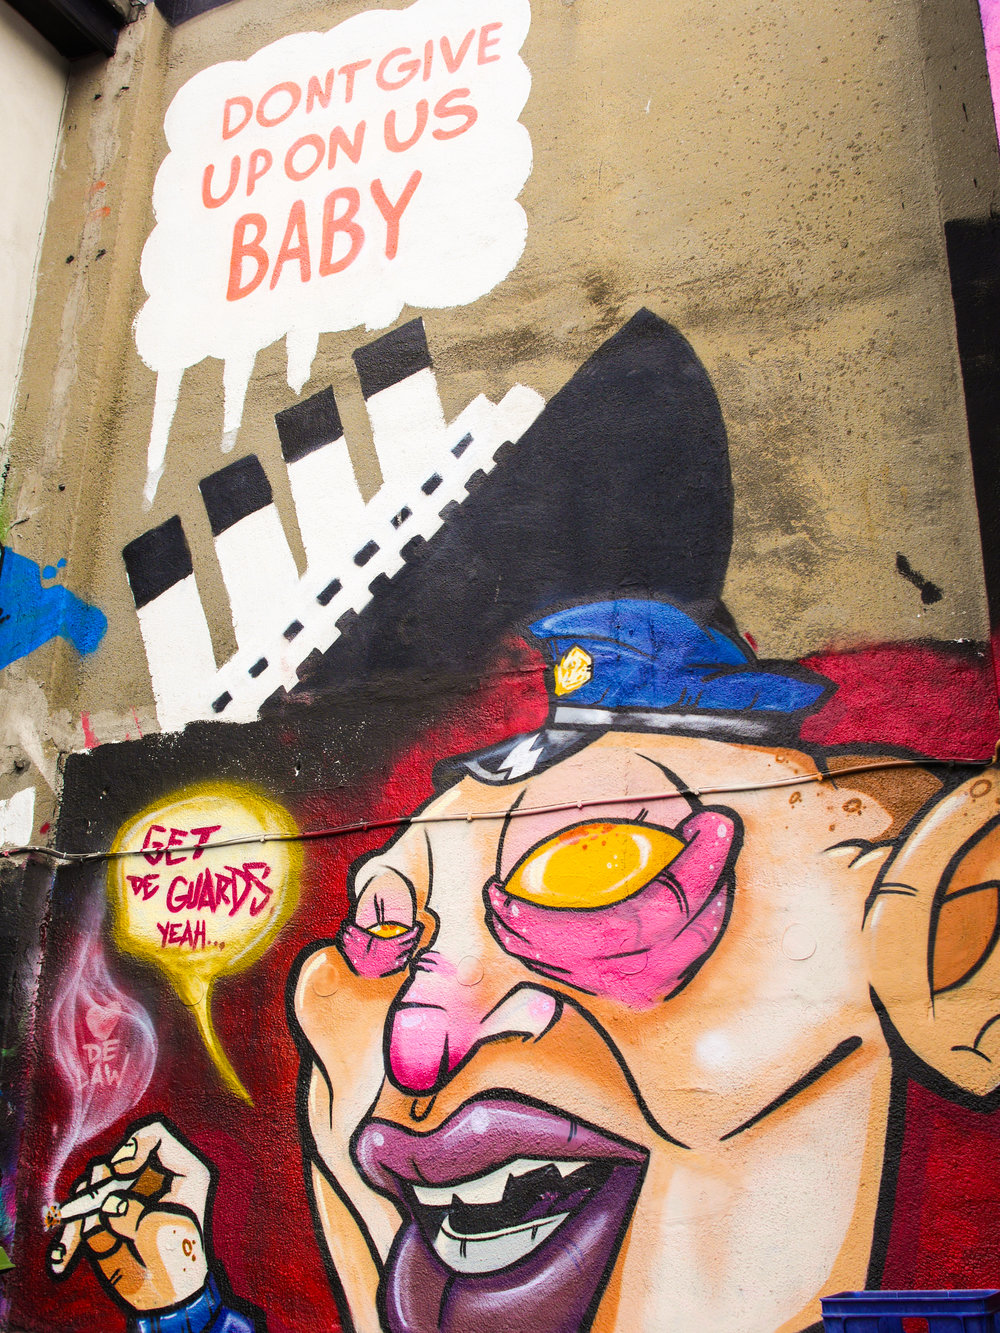 Street art at Tivoli Theatre in Dublin, Ireland